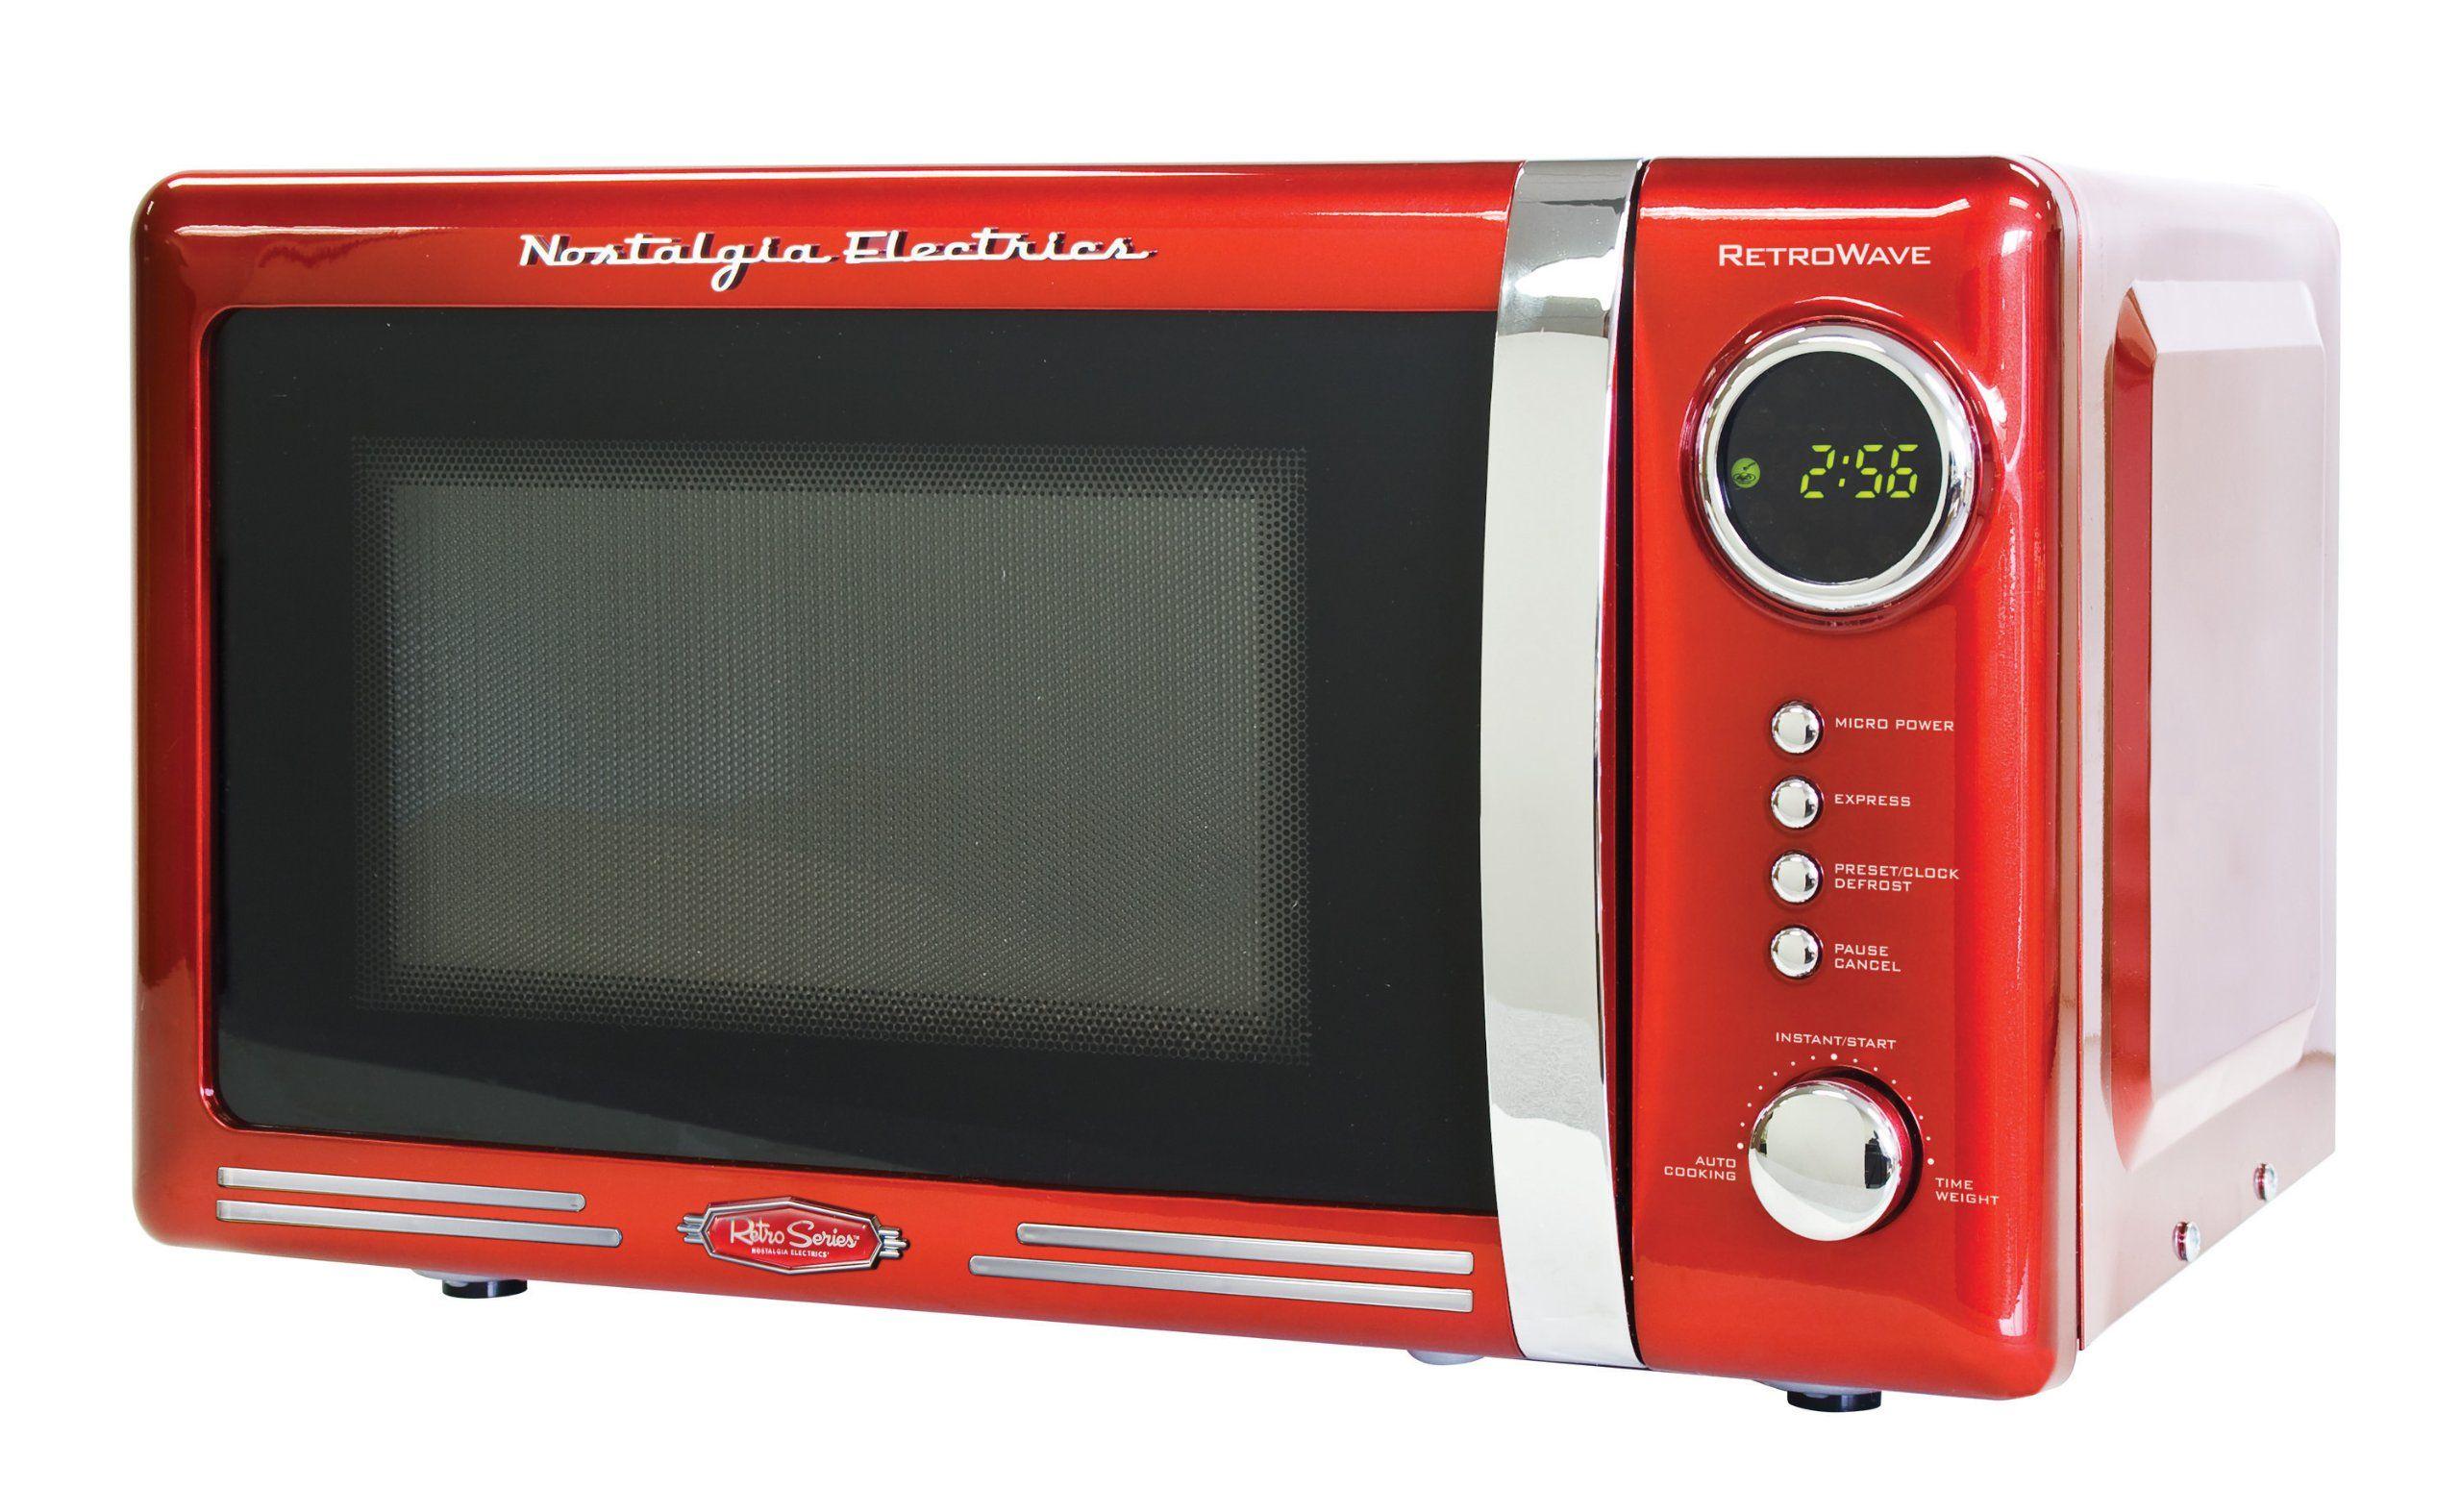 Small Countertop Microwave Oven Nostalgia Electrics Rmo770red